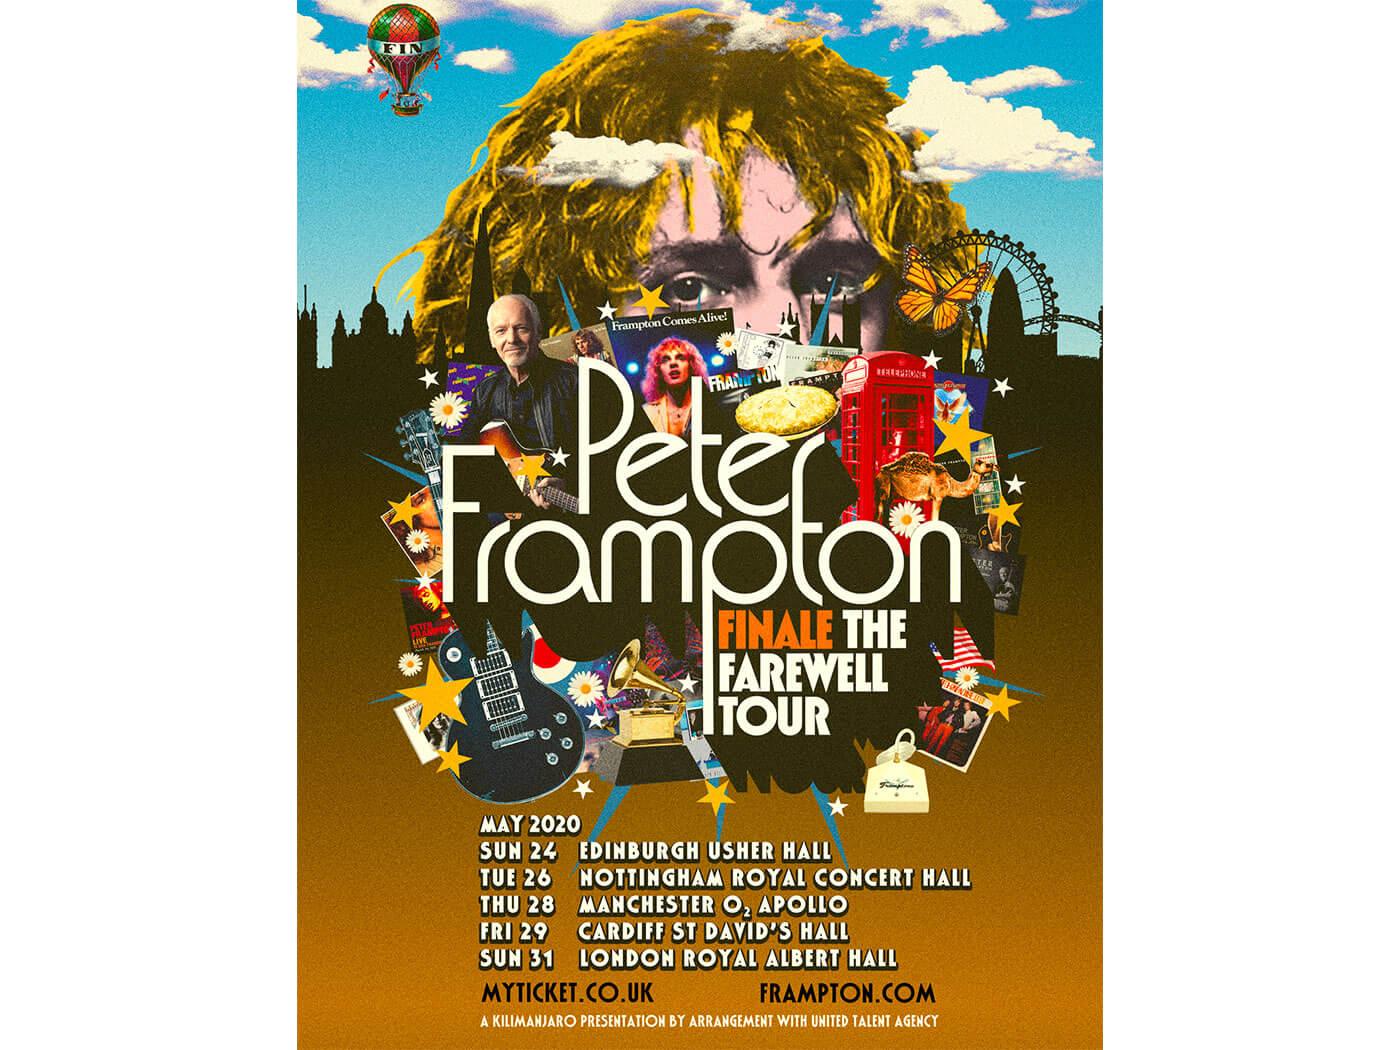 The Tour Poster for Peter Frampton's Farewell Tour